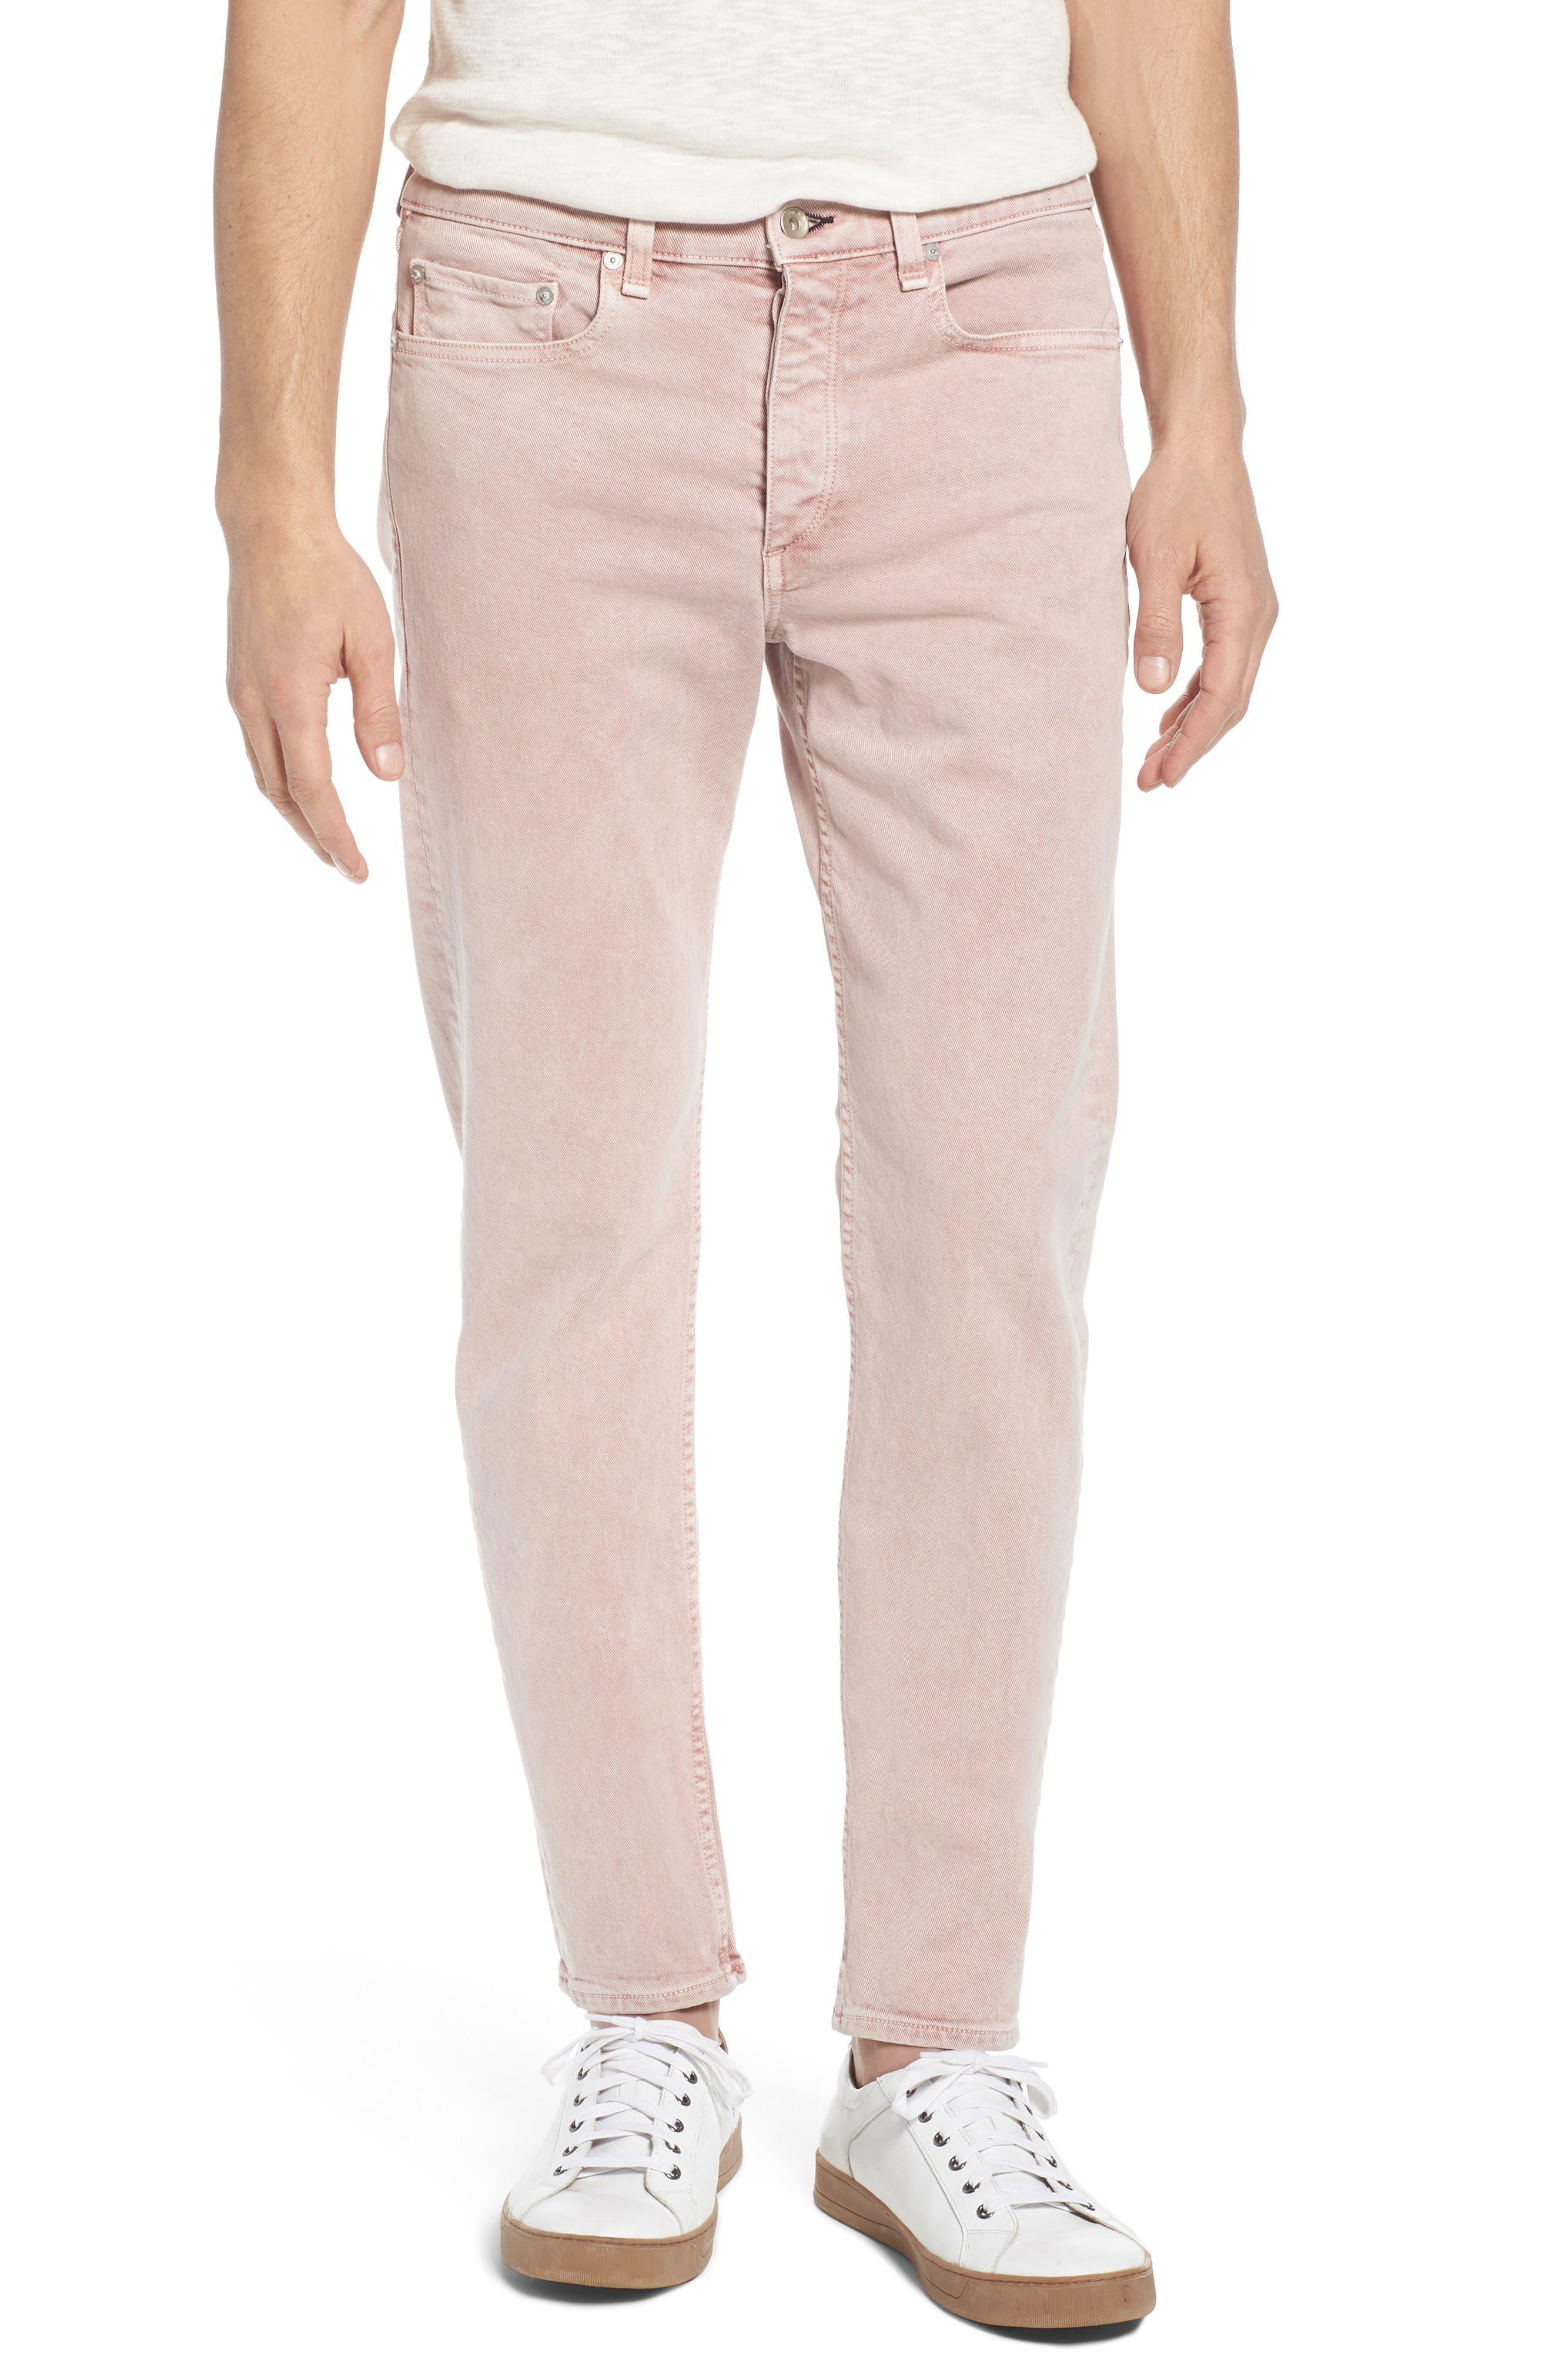 Fit 2 Slim Fit Jeans,                             Main thumbnail 1, color,                             BUD